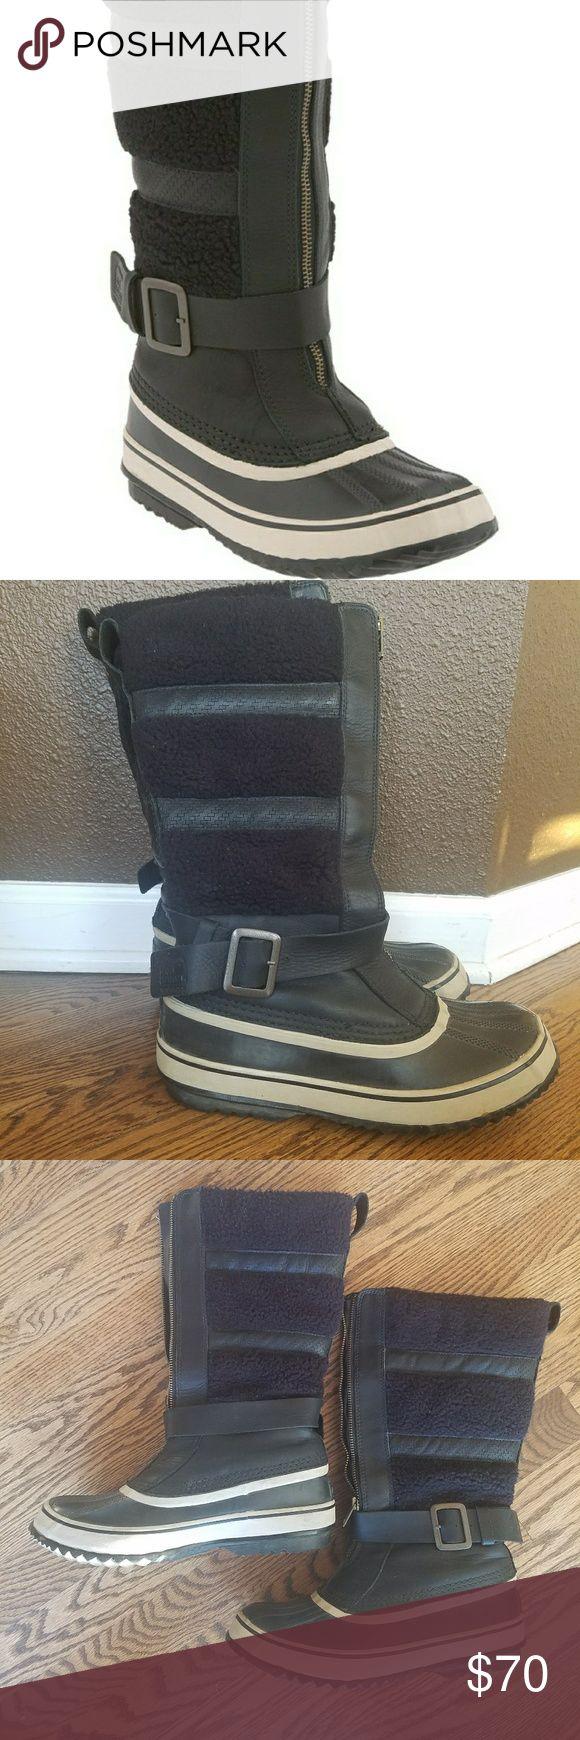 SOREL Helen of the Tundra Boots Size 9 waterproof SOREL boots. Black on black. Sorel Shoes Winter & Rain Boots